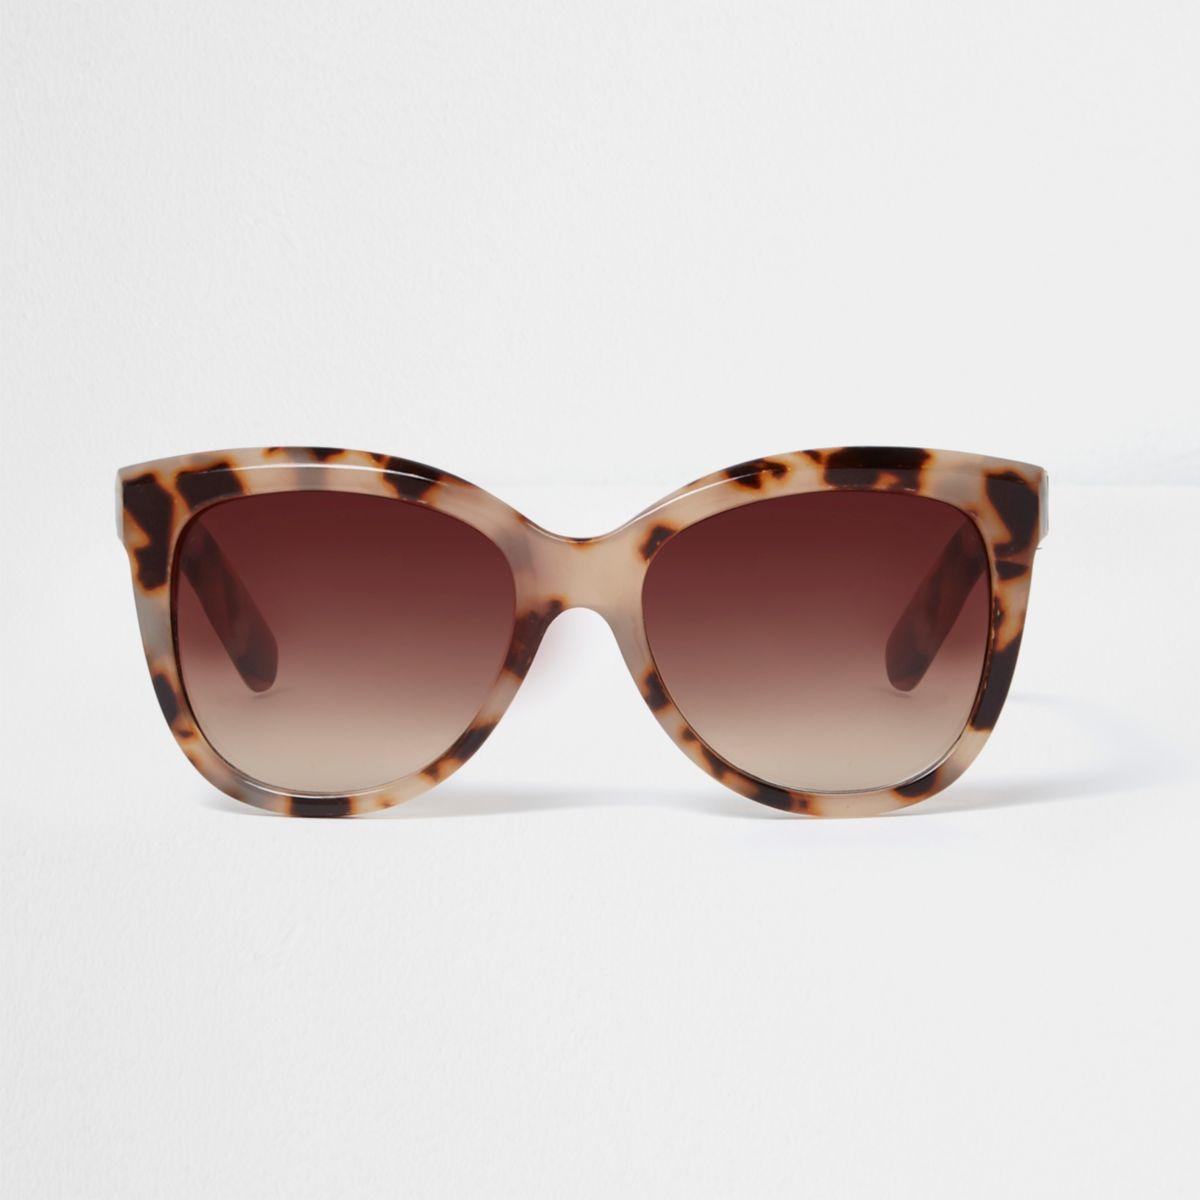 Beige glamour-zonnebril met luipaardprint